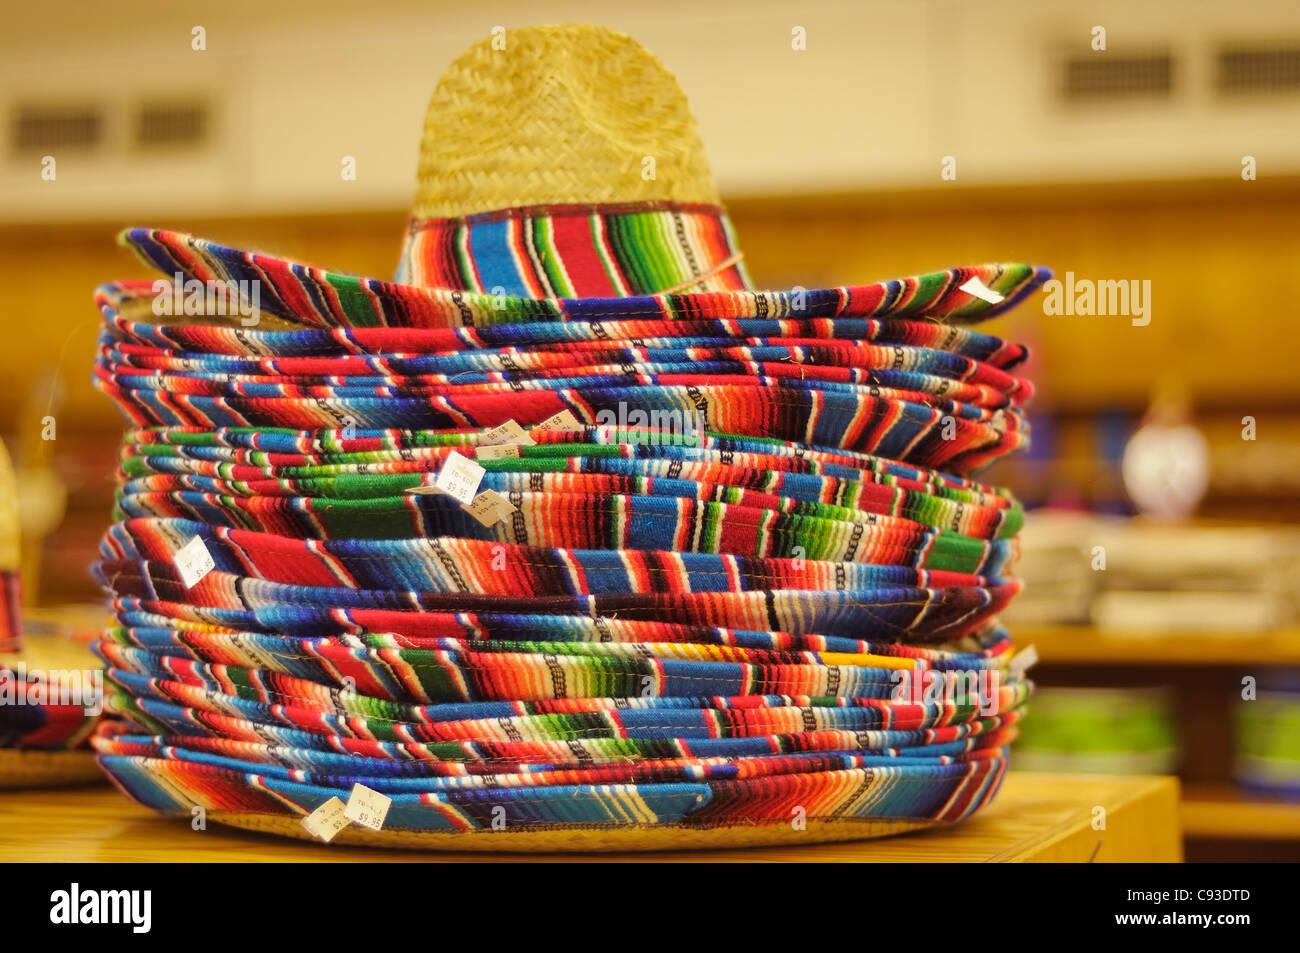 Sombreros at a souvenir shop at South of the Border, South Carolina - Stock Image